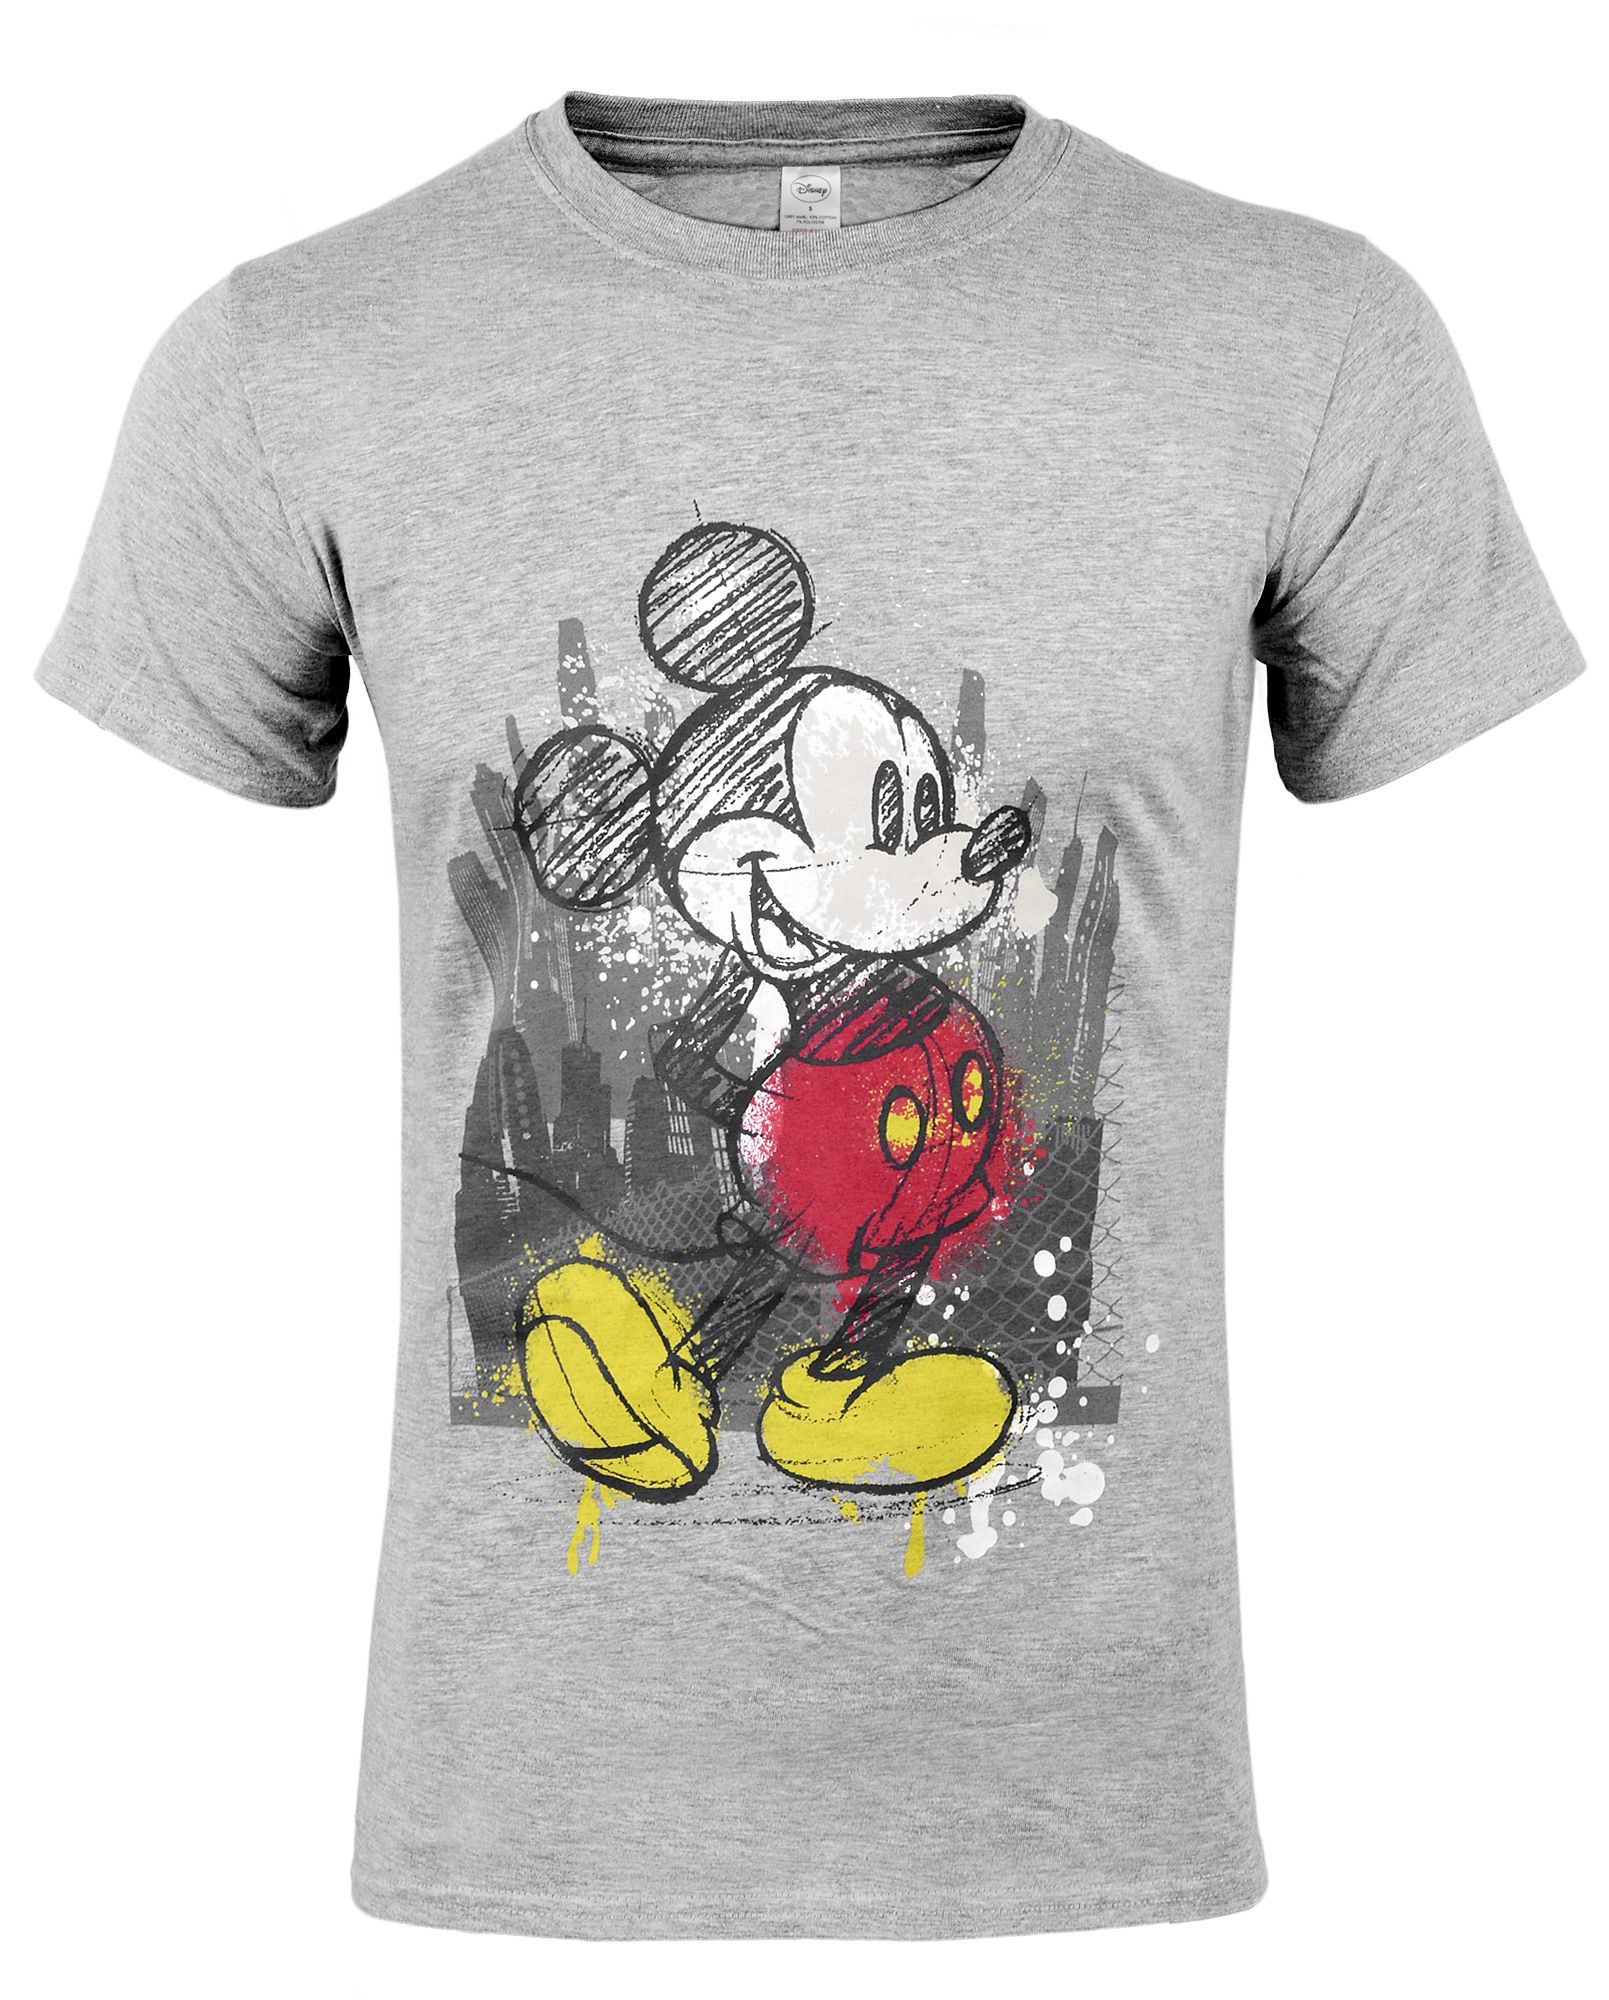 Тениска Micky Mouse - Tap, сива, размер L - 1